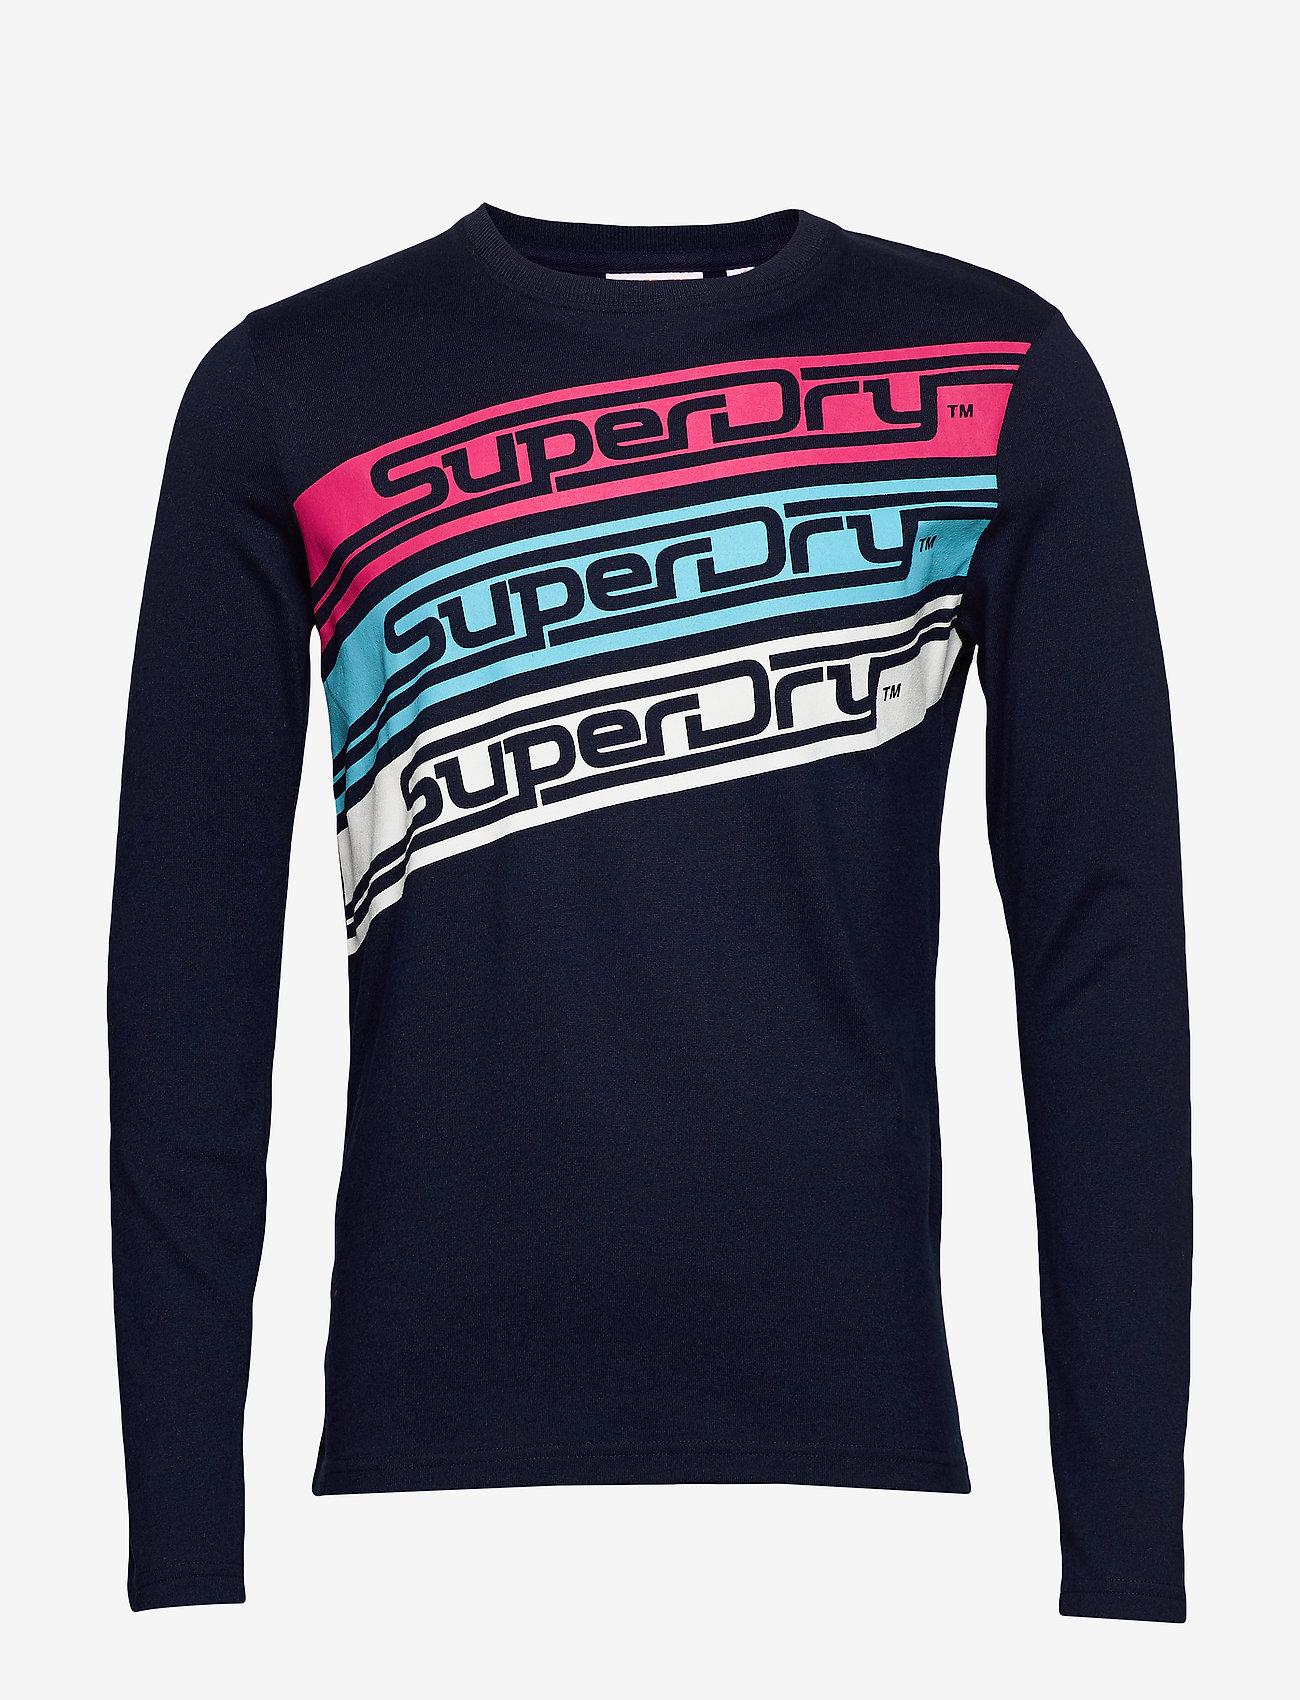 Superdry Mens Downhill Racer Ls Tee Long Sleeve Top